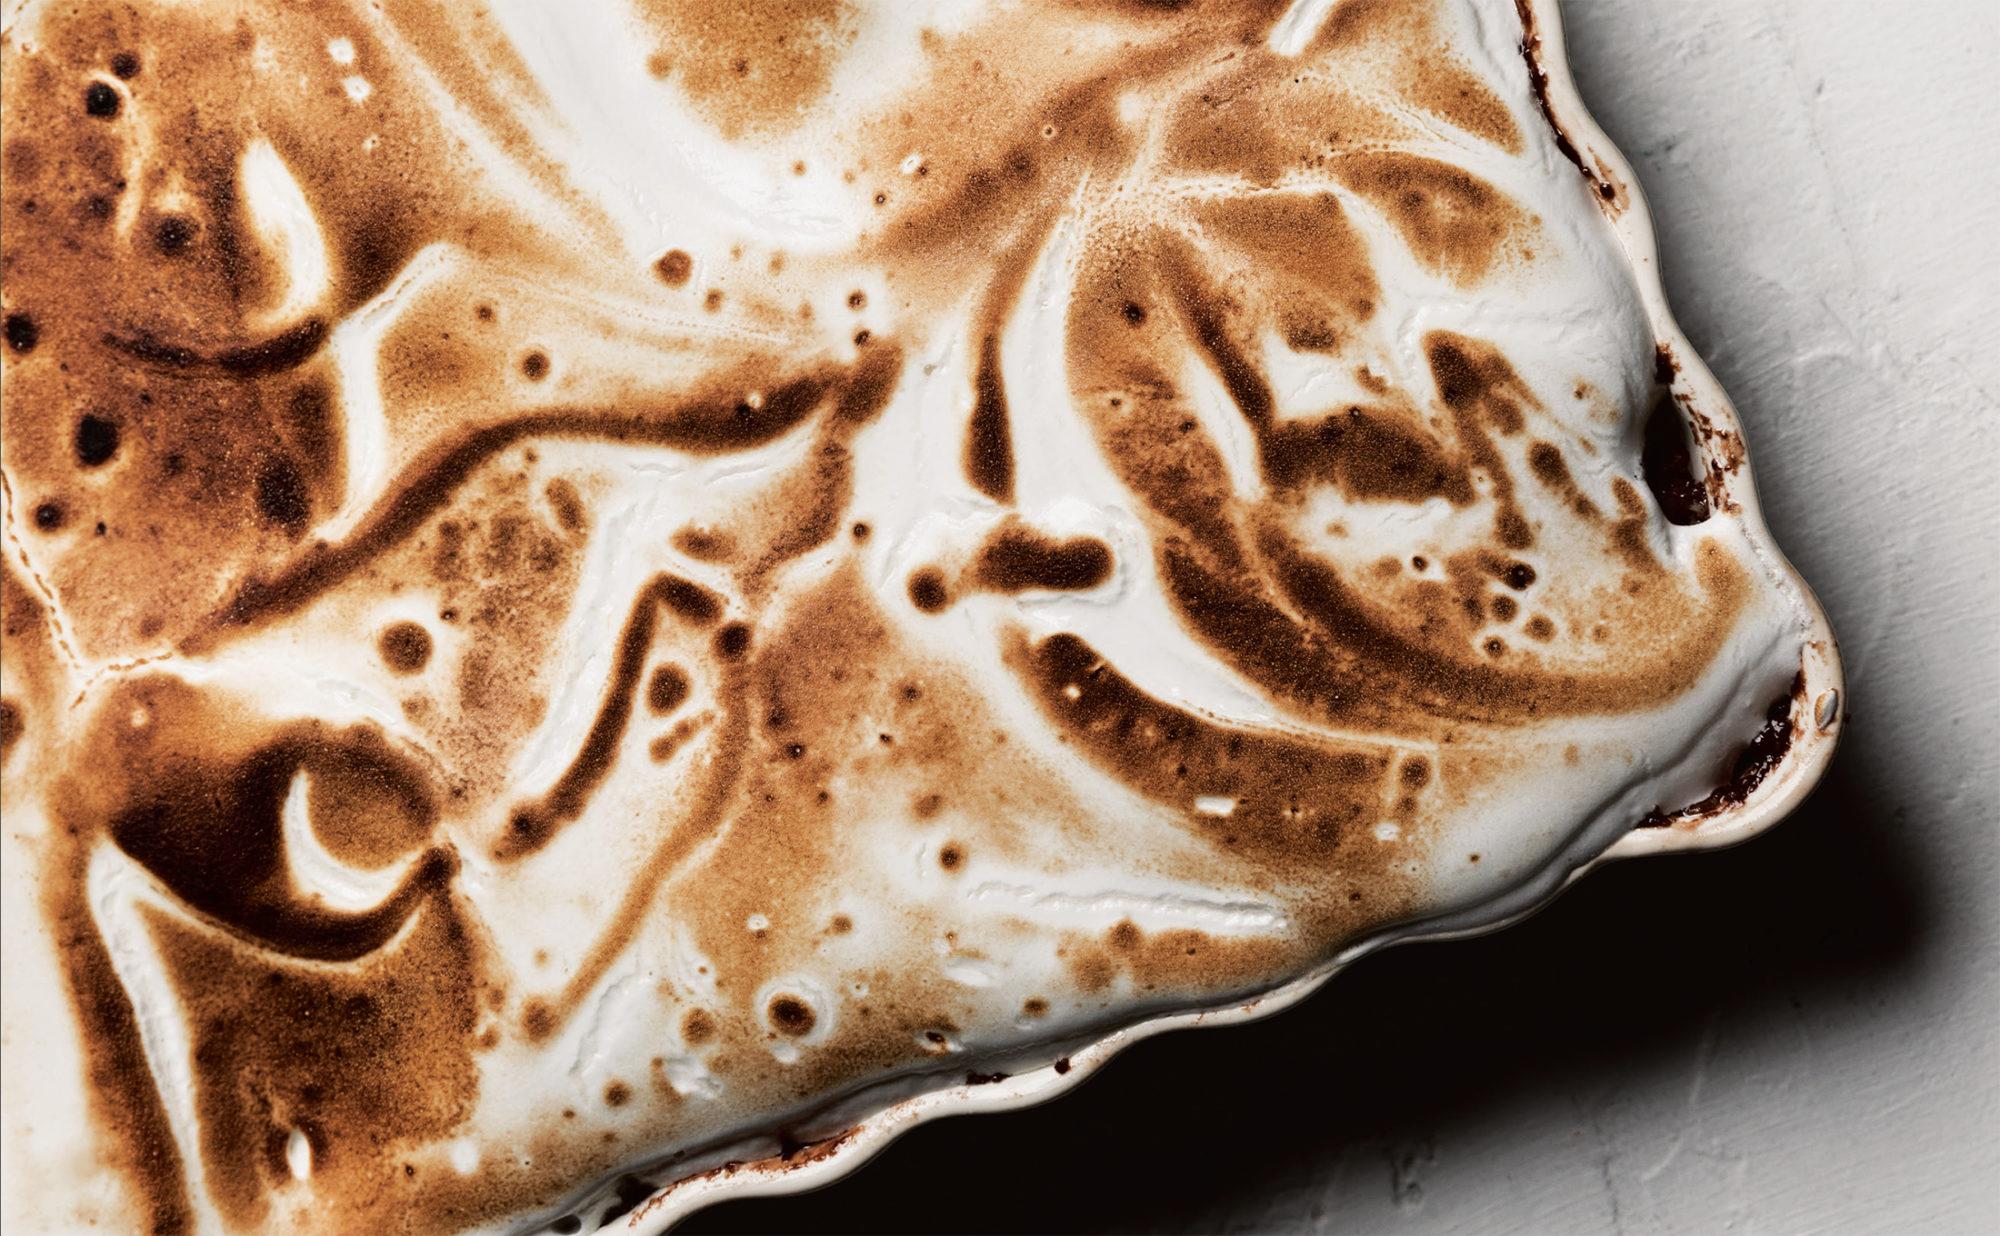 Article-Nutellasagna-Lasagna-Dessert